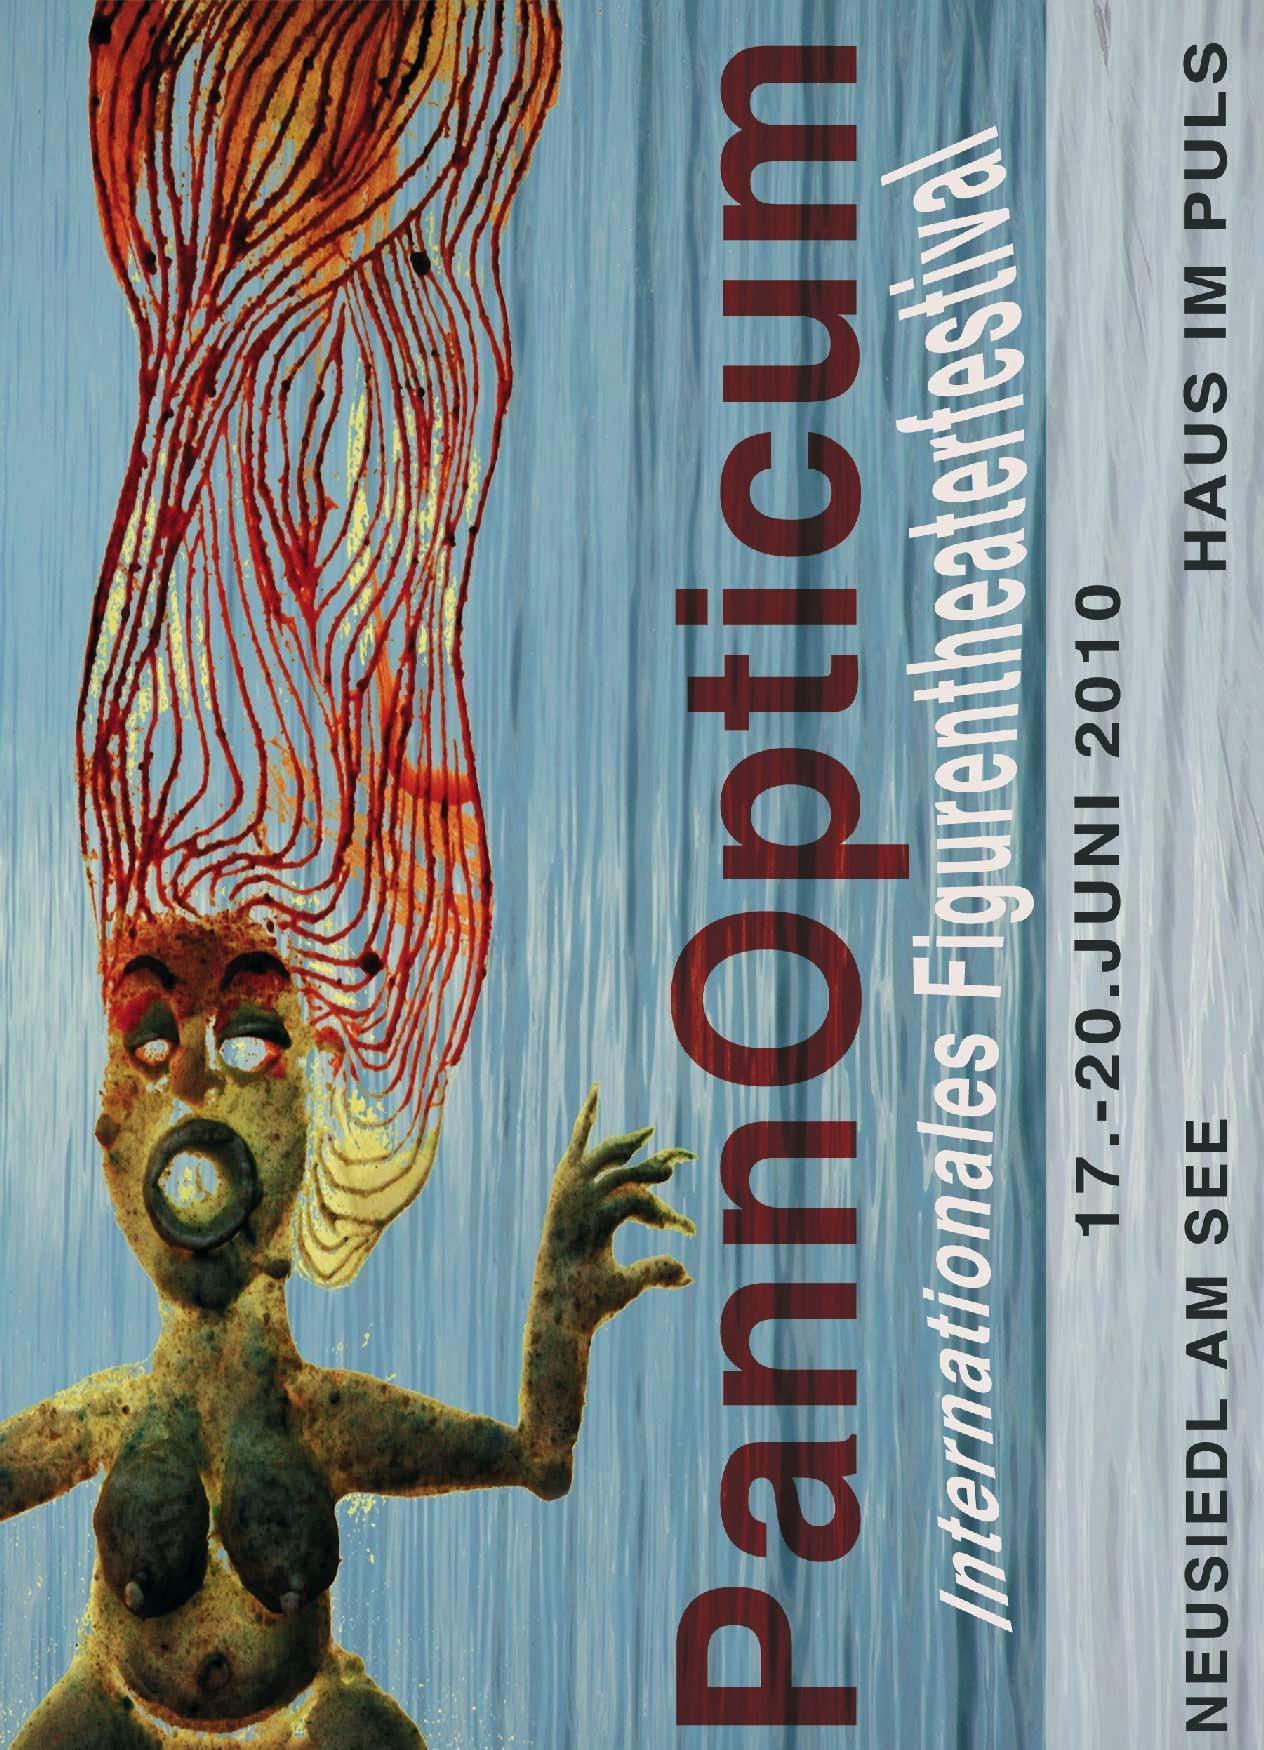 PannOpticum-2010-International-Festival-Neusiedl-am-See-Austria.jpg